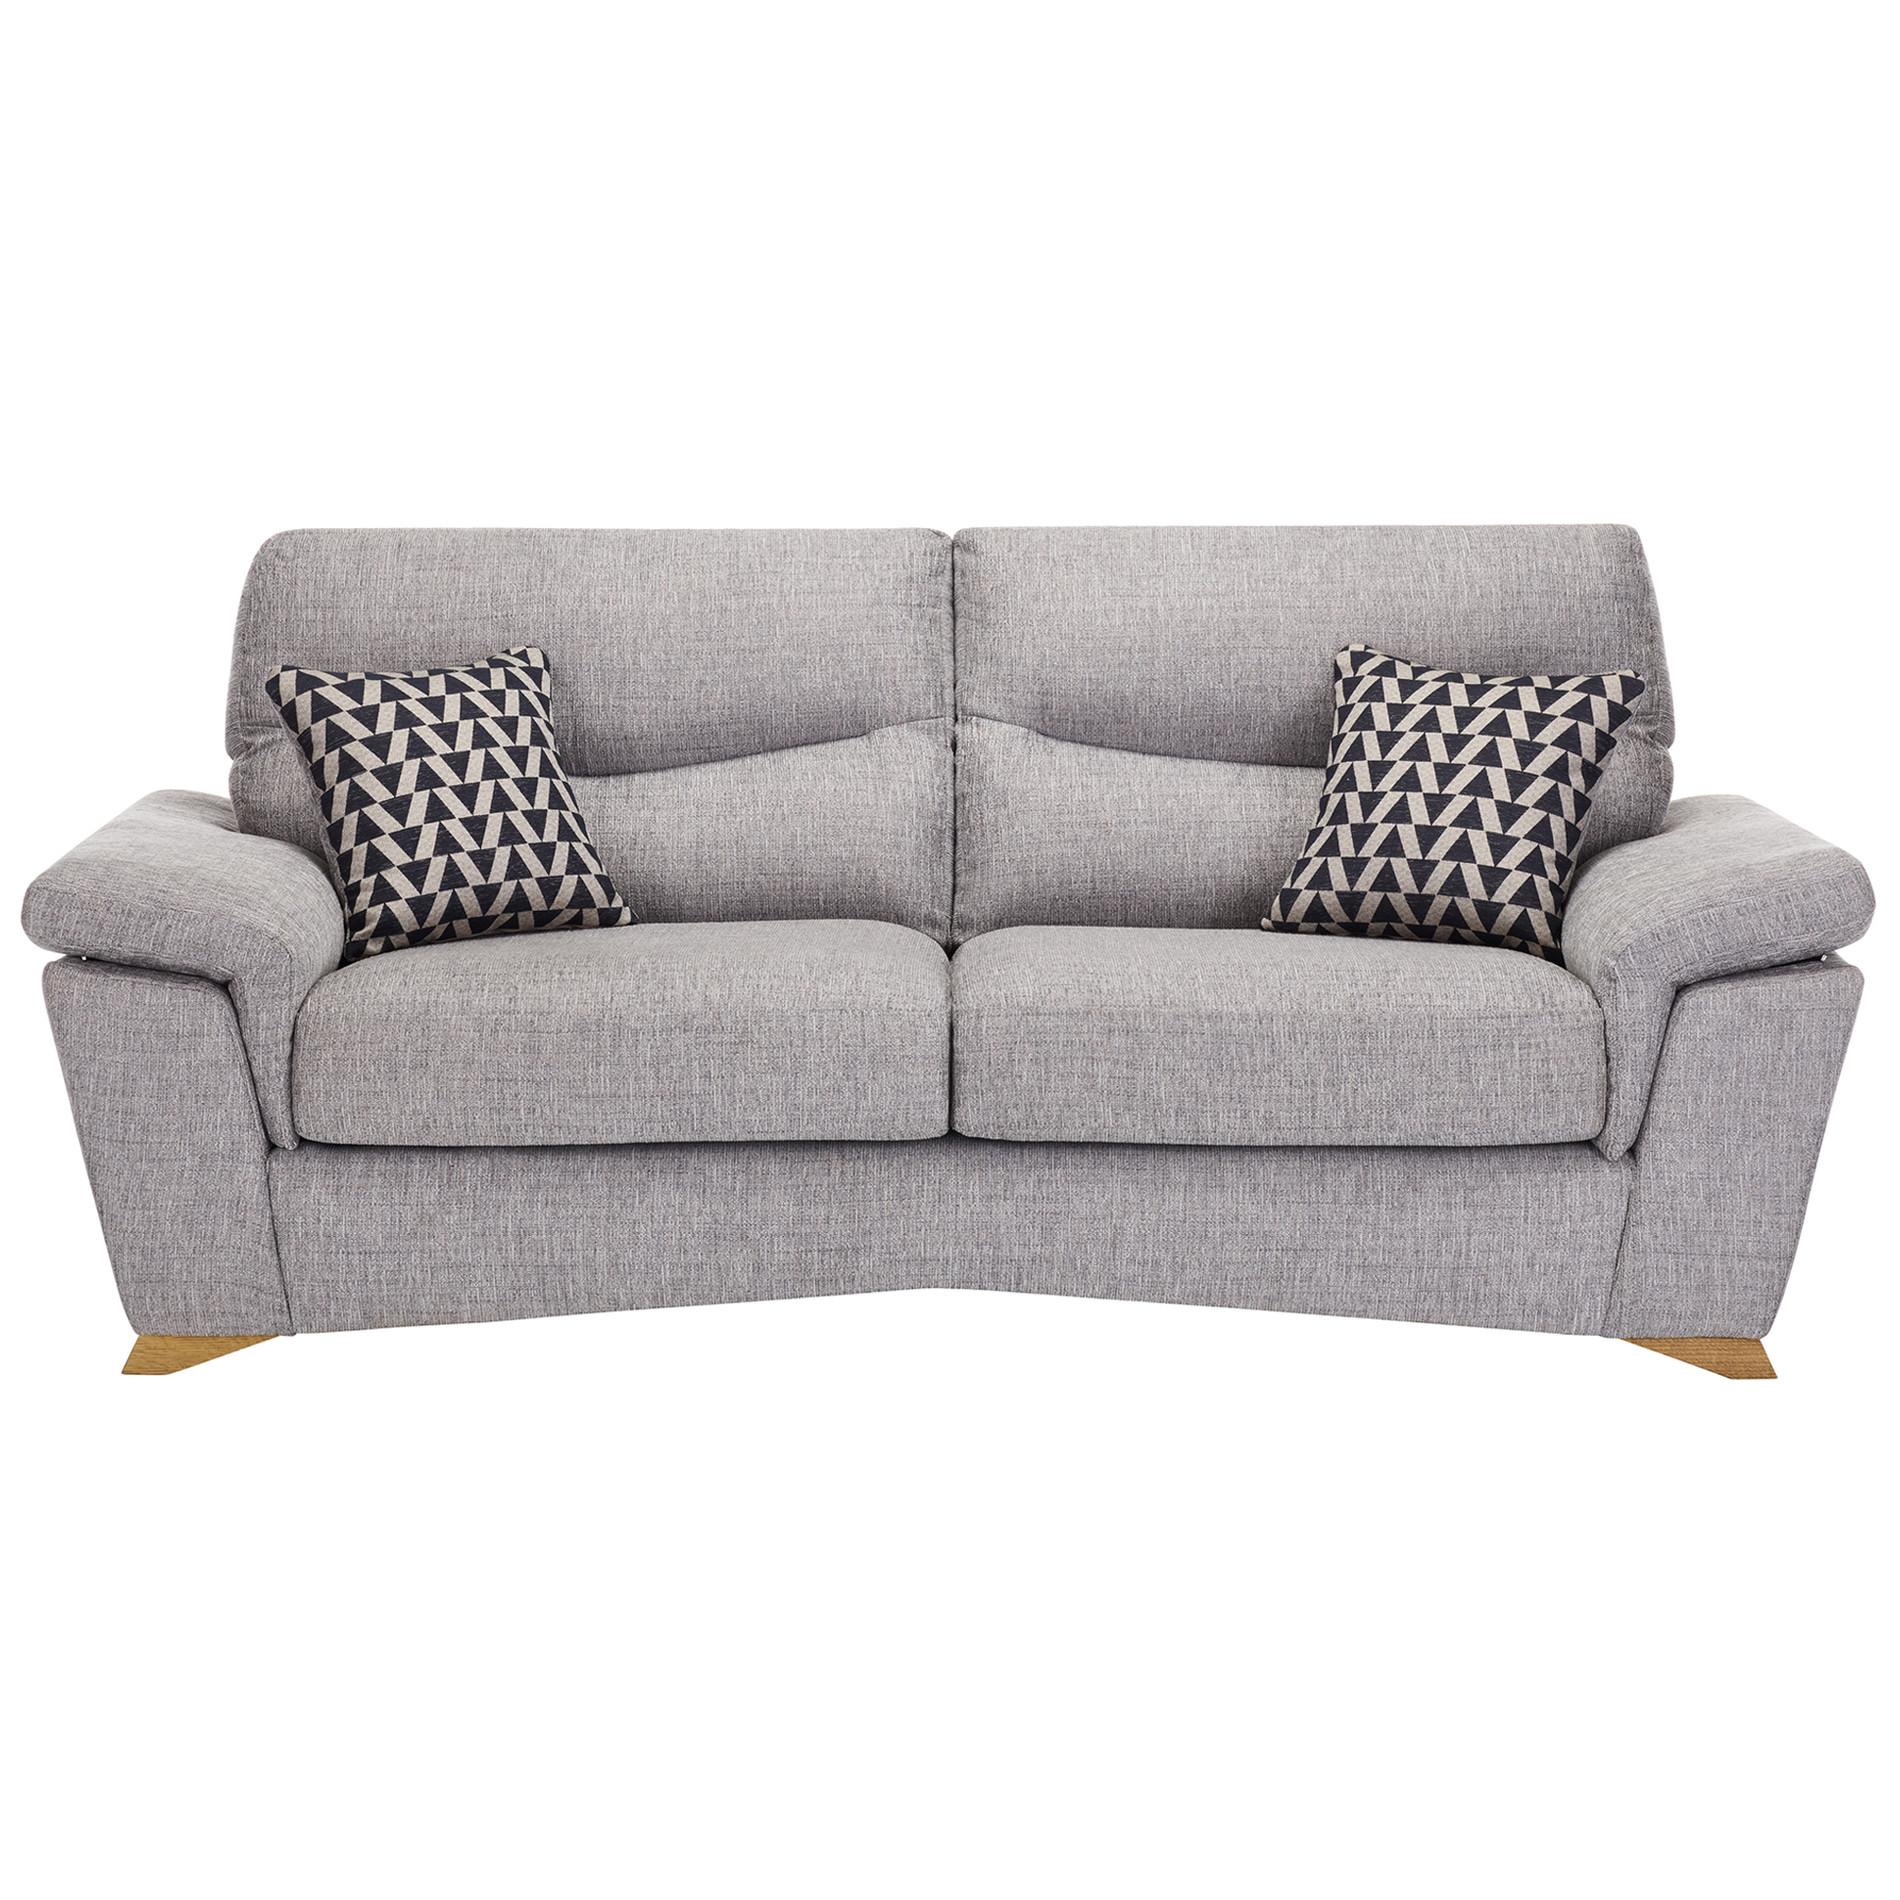 Marbella Bedroom Furniture Marbella Storage Footstool Sofa In Hamilton Silver With Kent Black